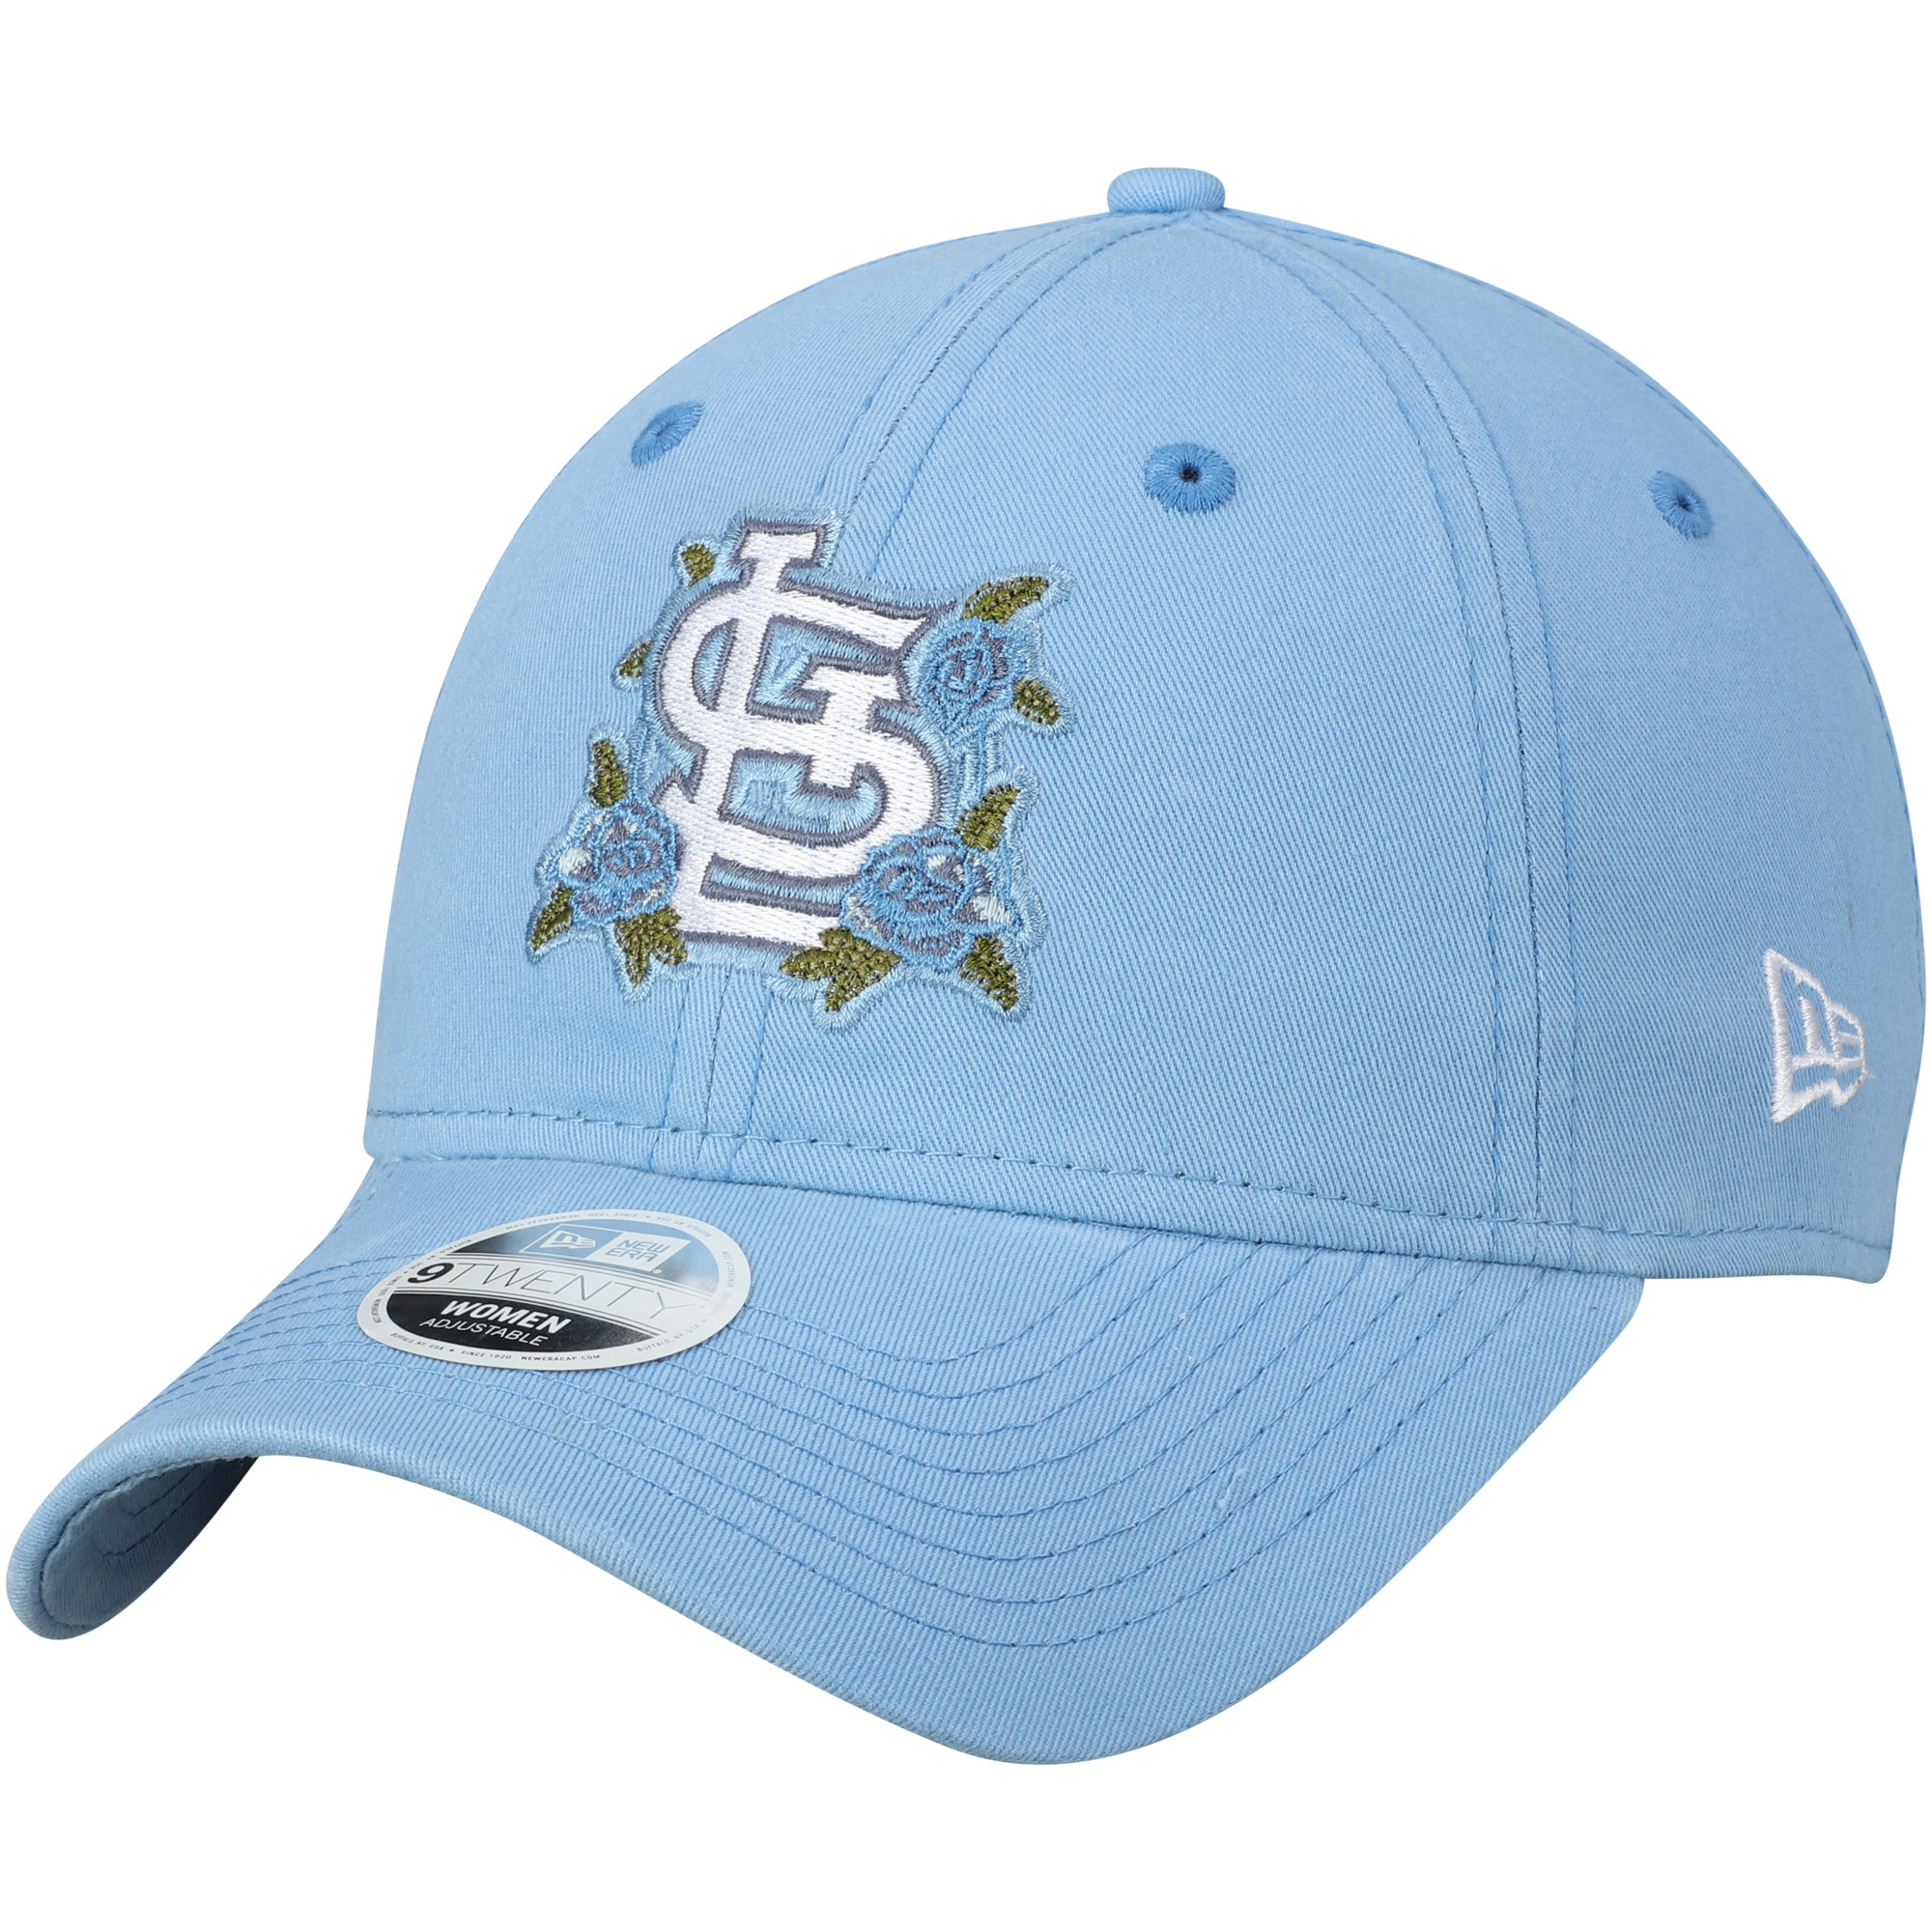 St. Louis Cardinals New Era Women's Bloom 9TWENTY Adjustable Hat - Blue - OSFA